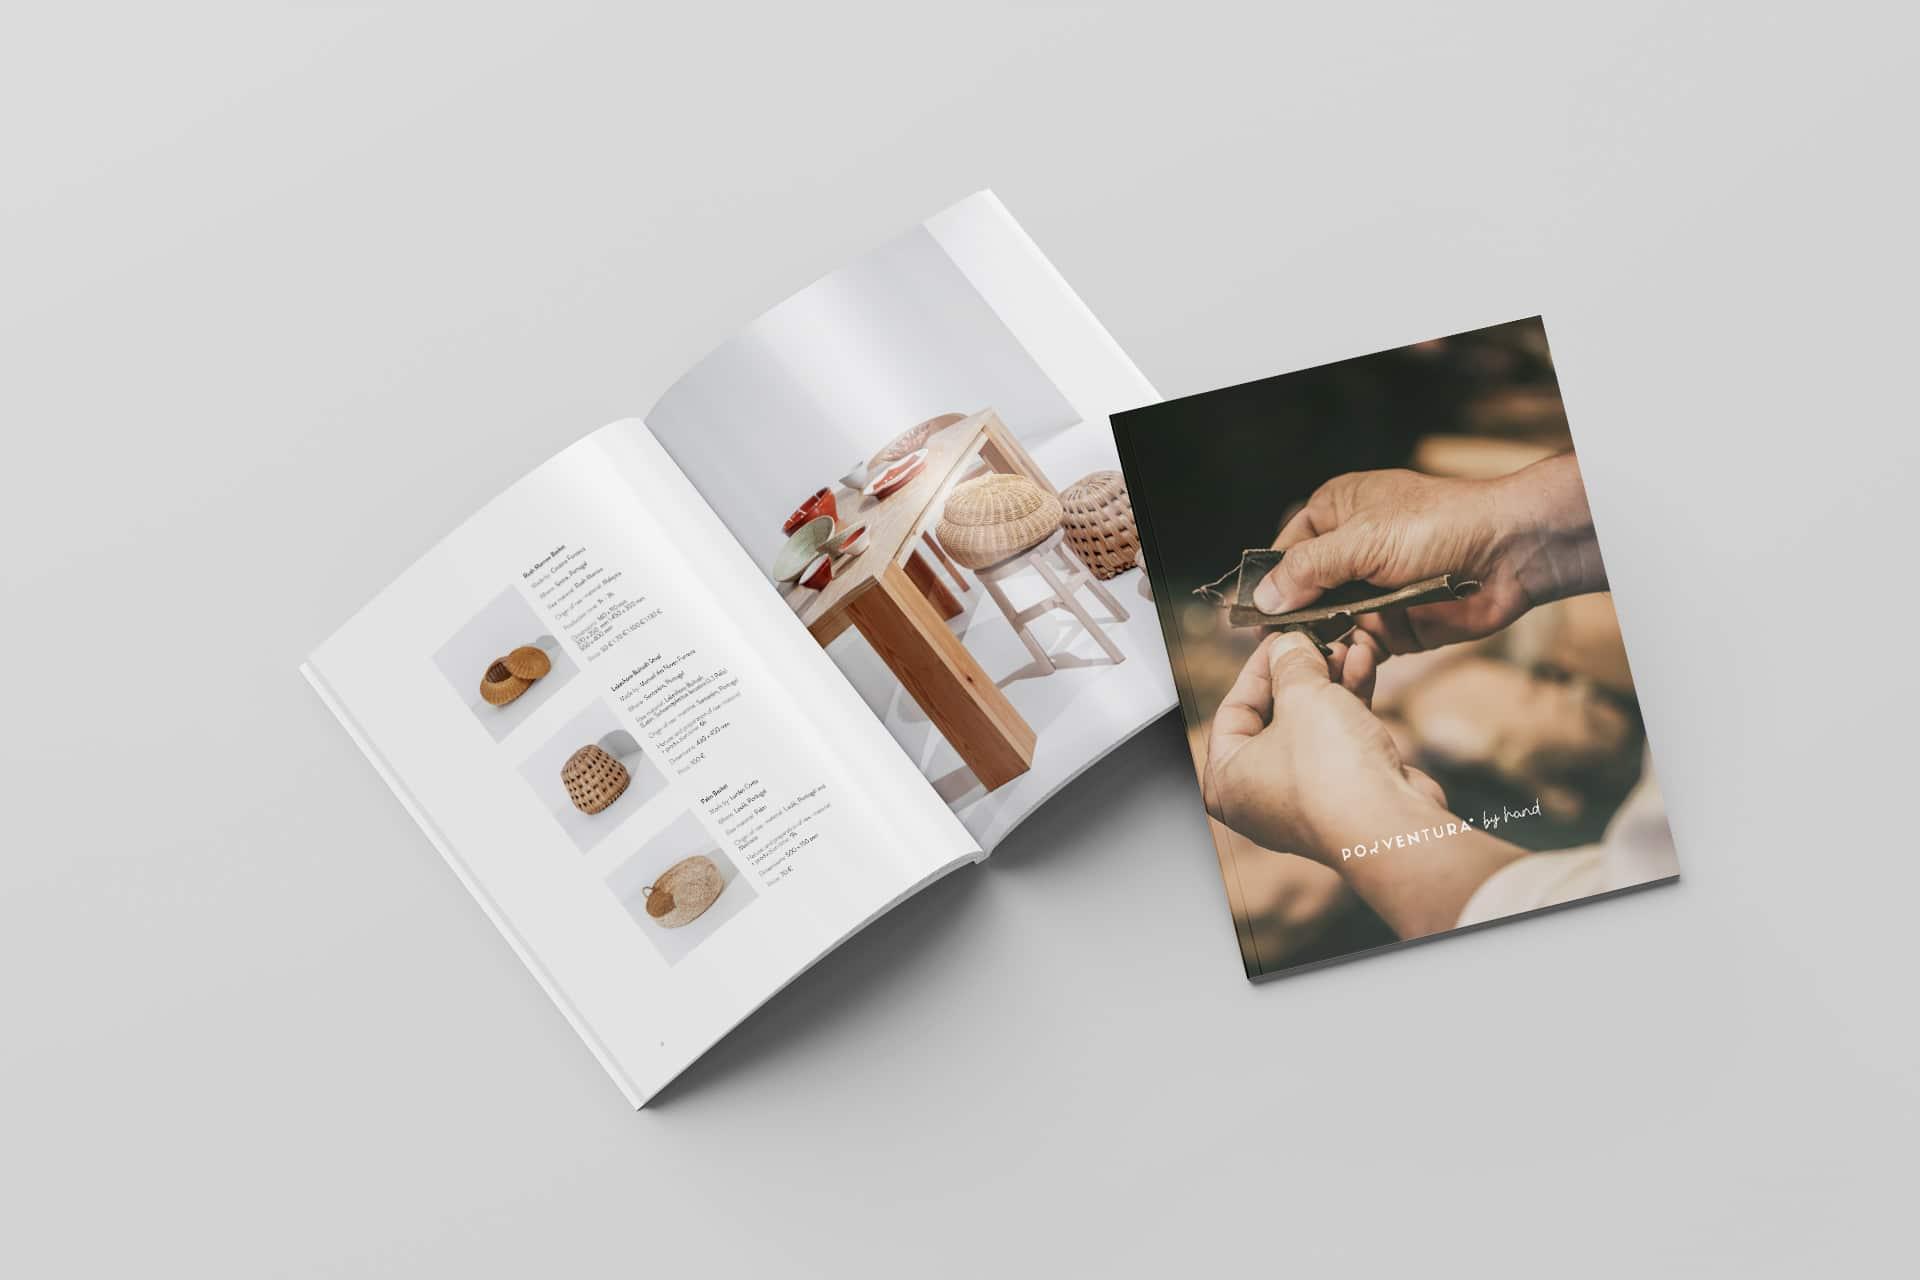 Catalogue_Porventurabyhand - DESIGN BY MIGUEL SOEIRO